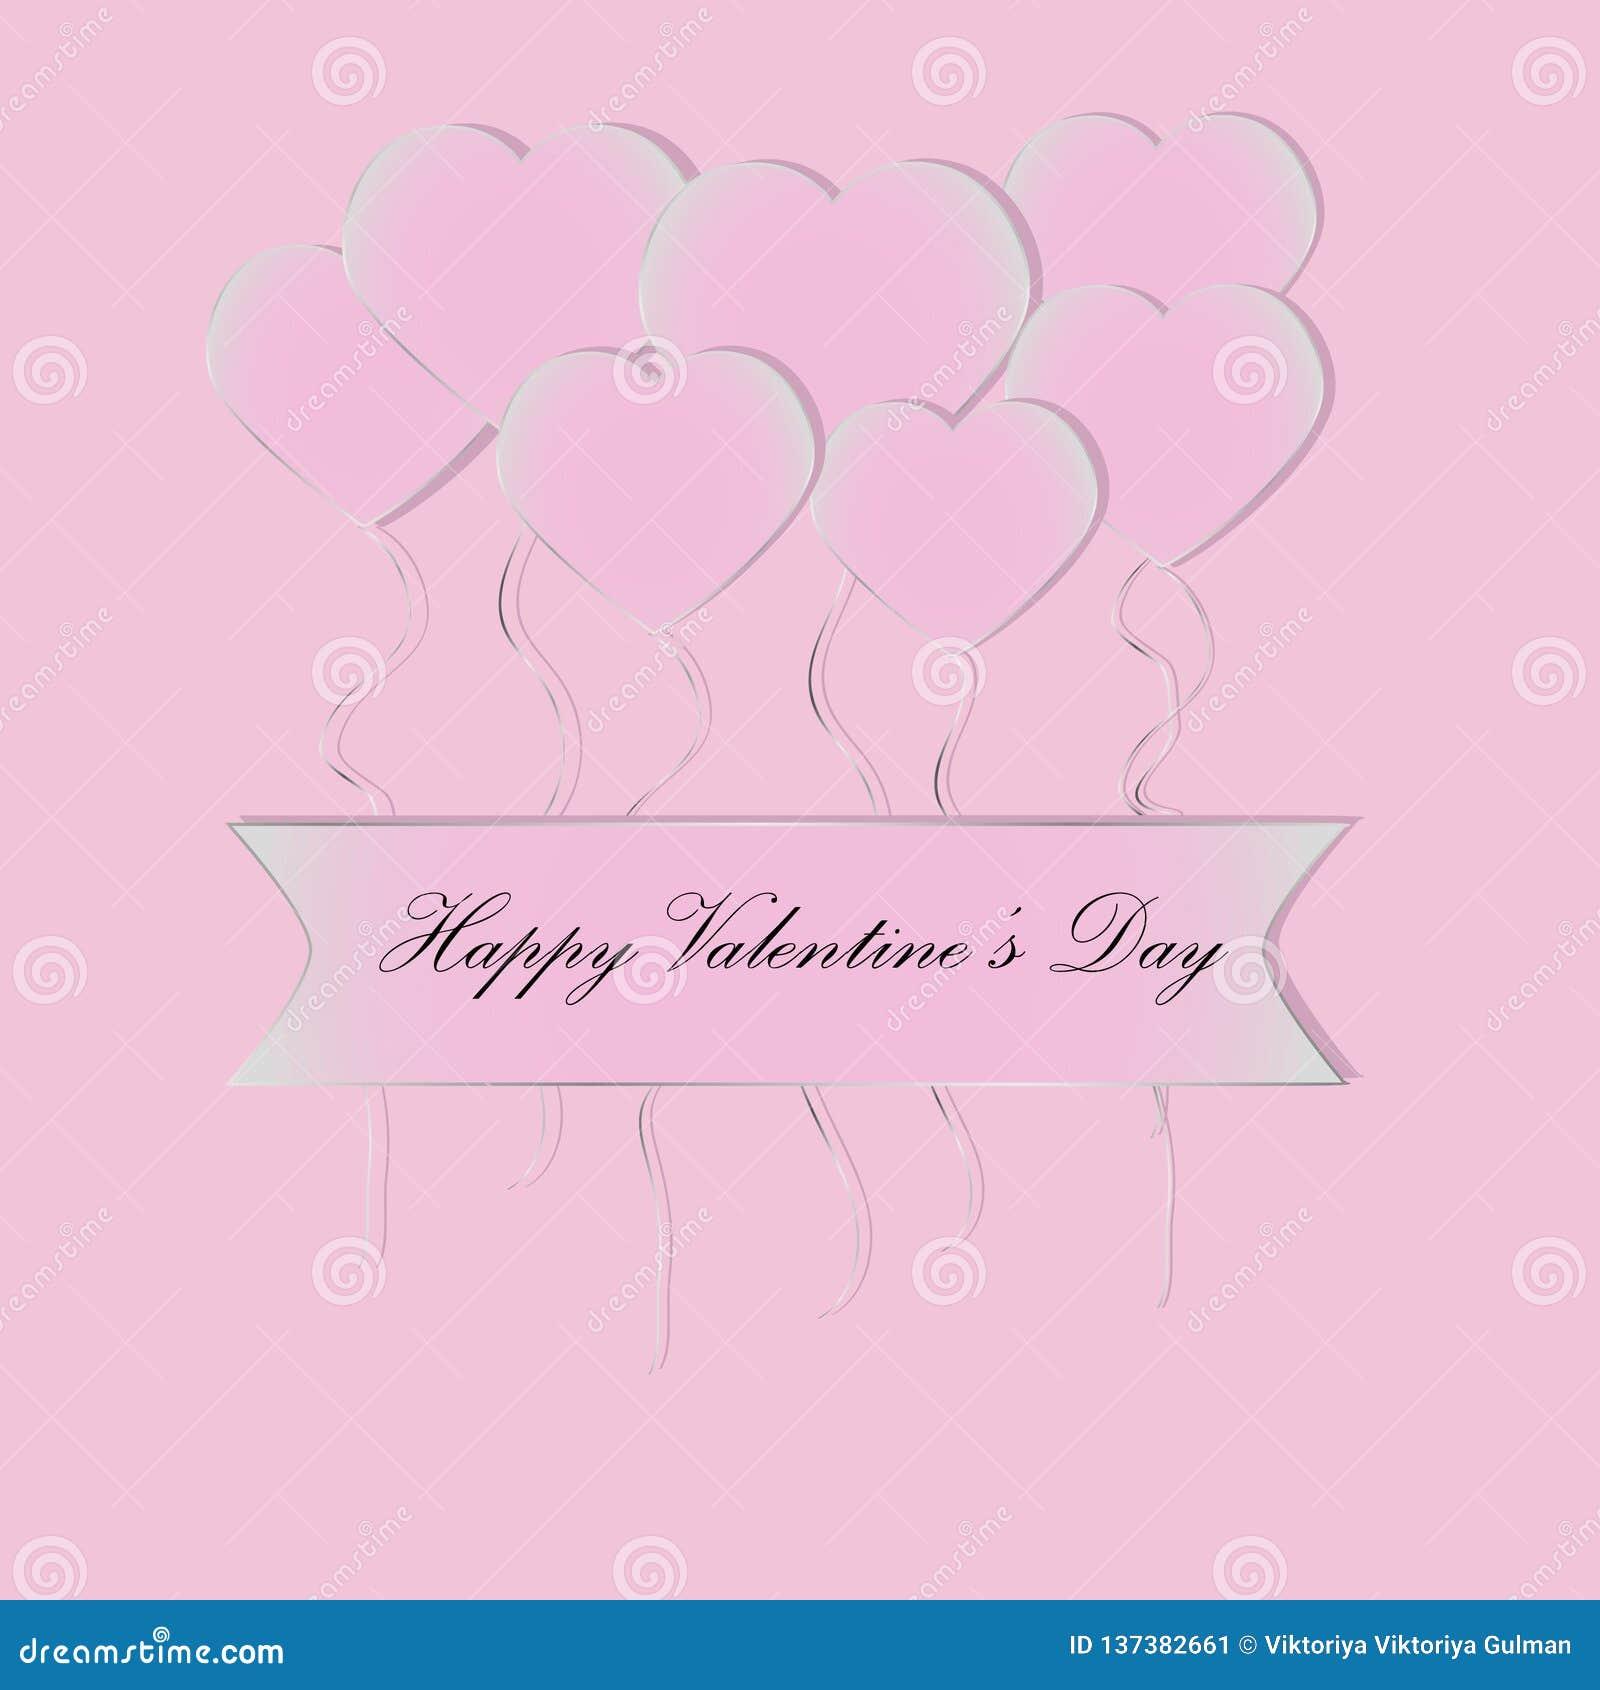 Vector Valentine`s Day invitation